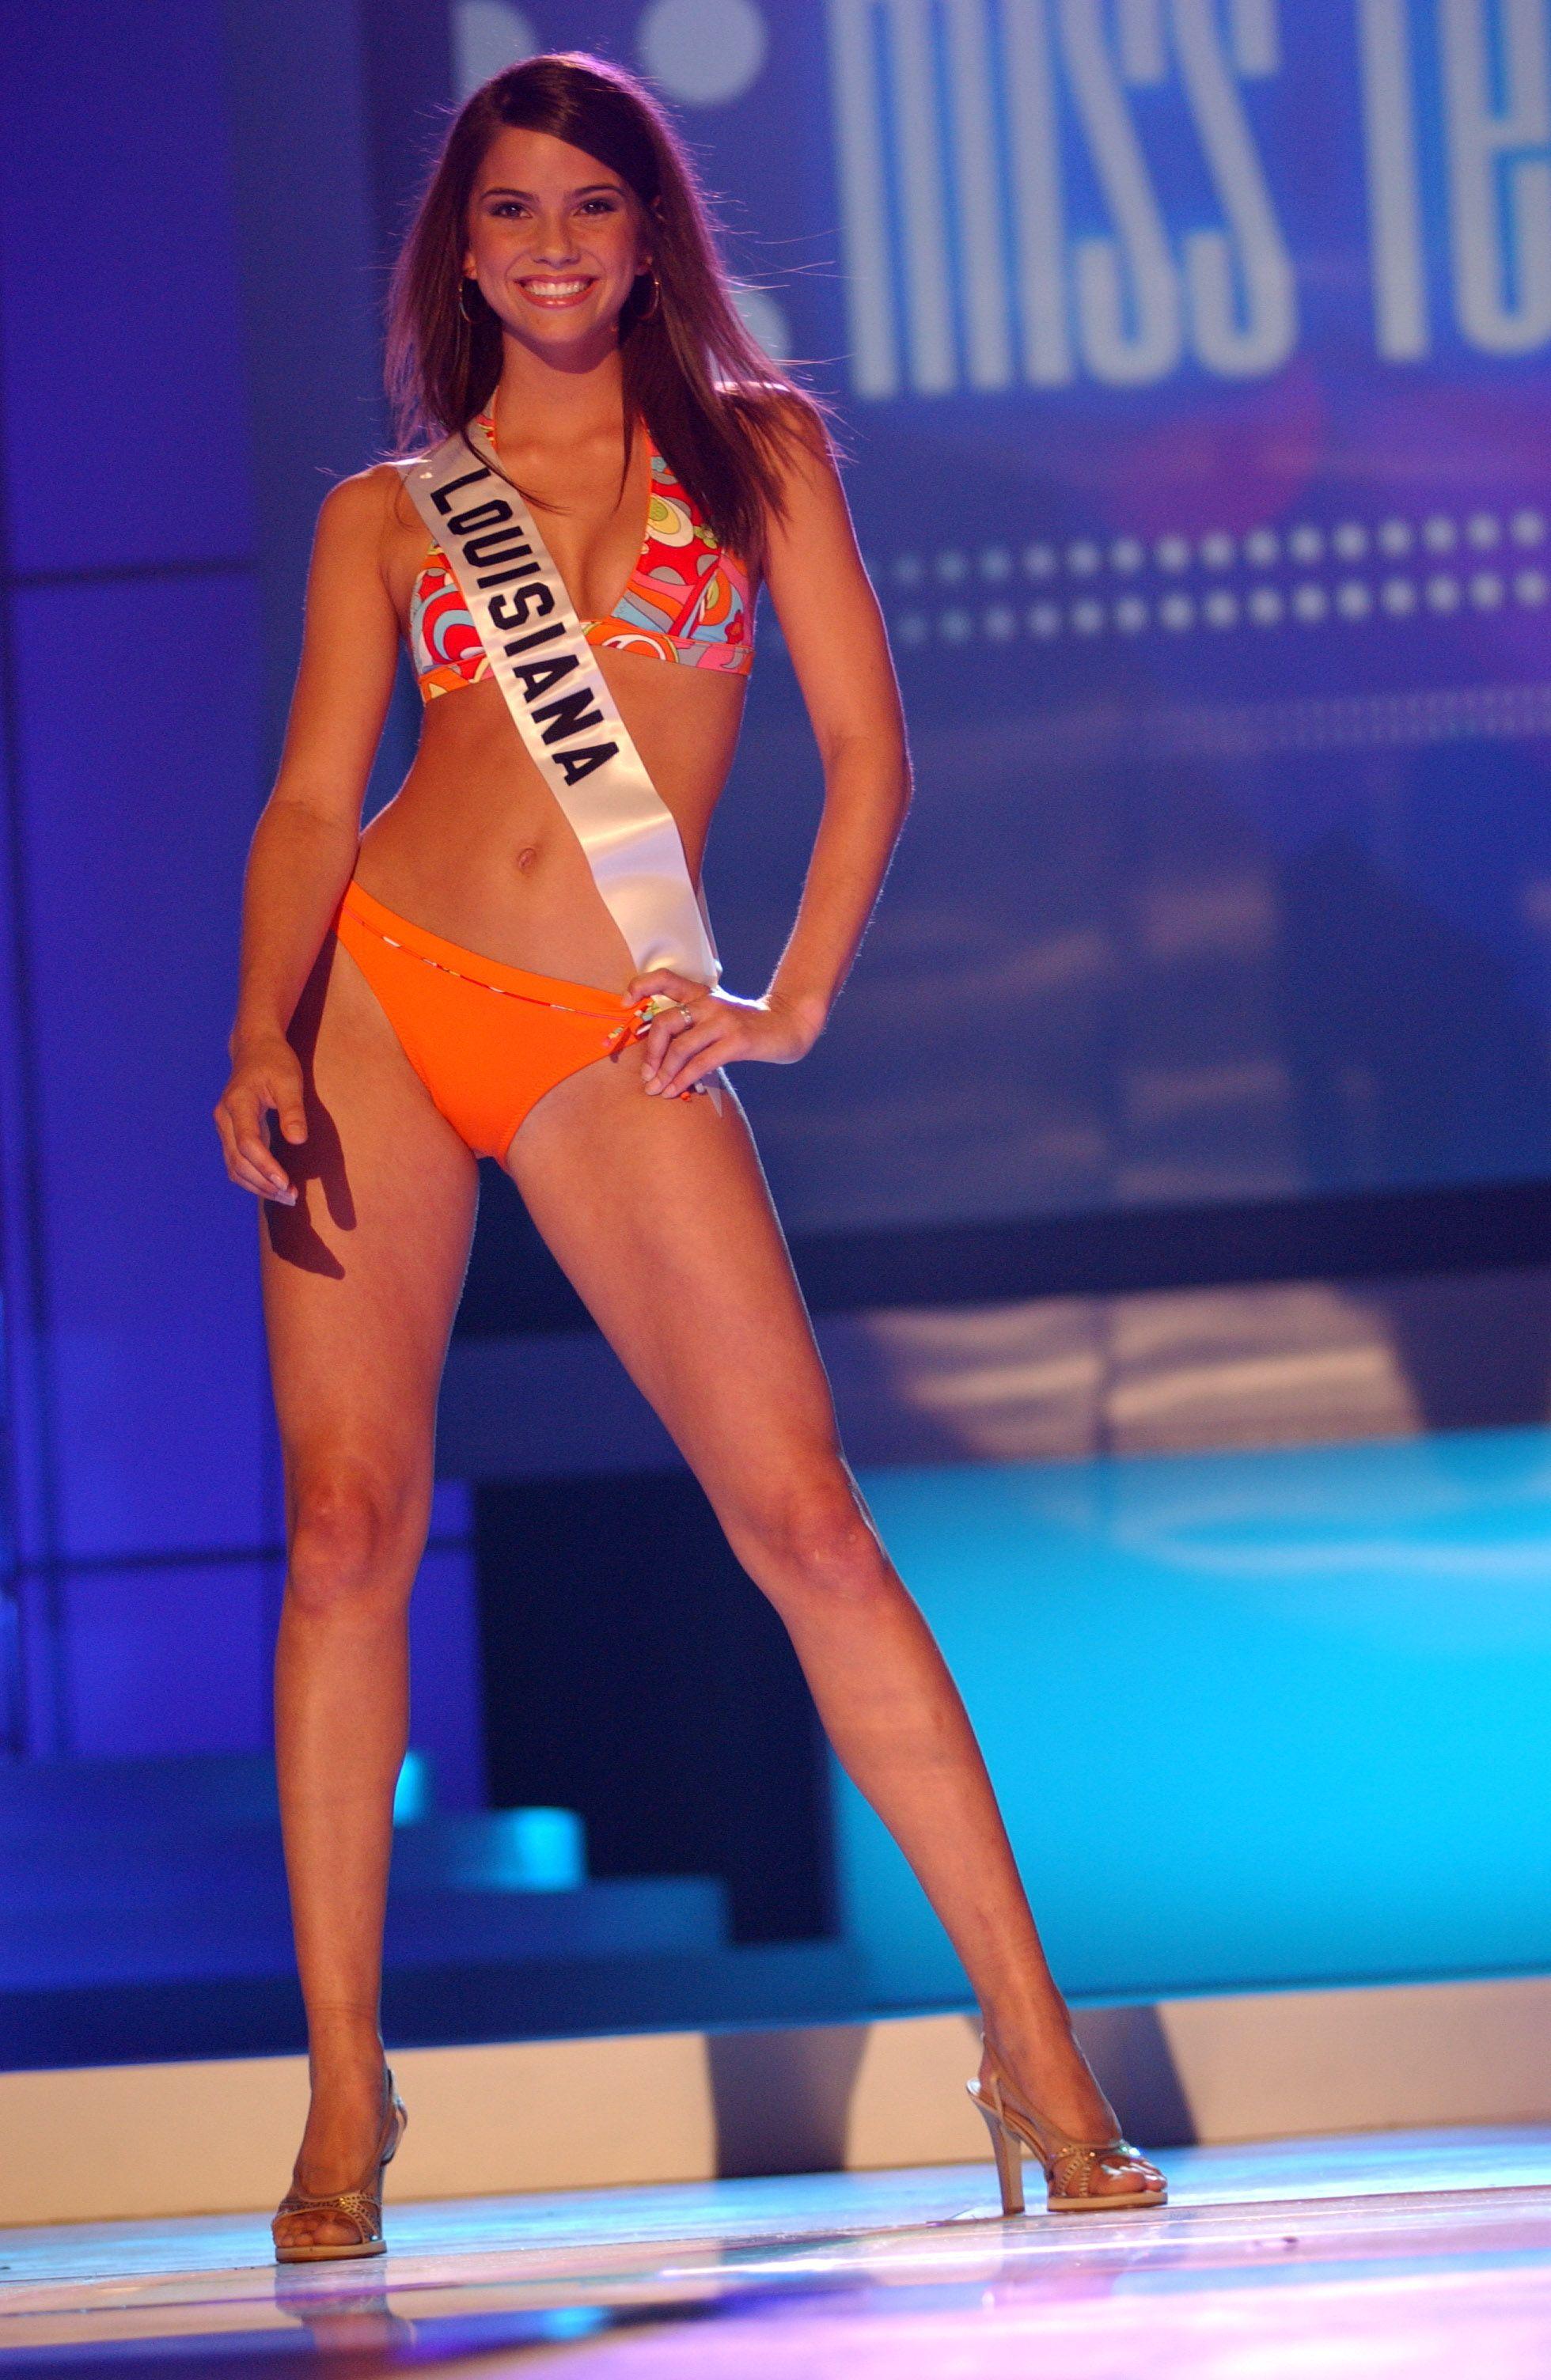 Bikini Laurine Matt naked (13 photos), Topless, Paparazzi, Boobs, swimsuit 2015